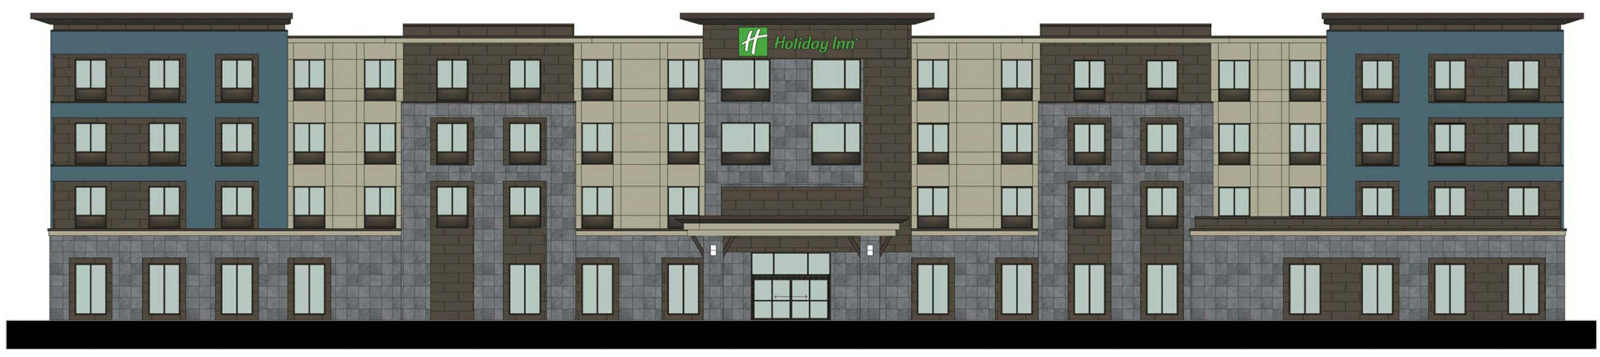 Holiday Inn Hillsboro, OR